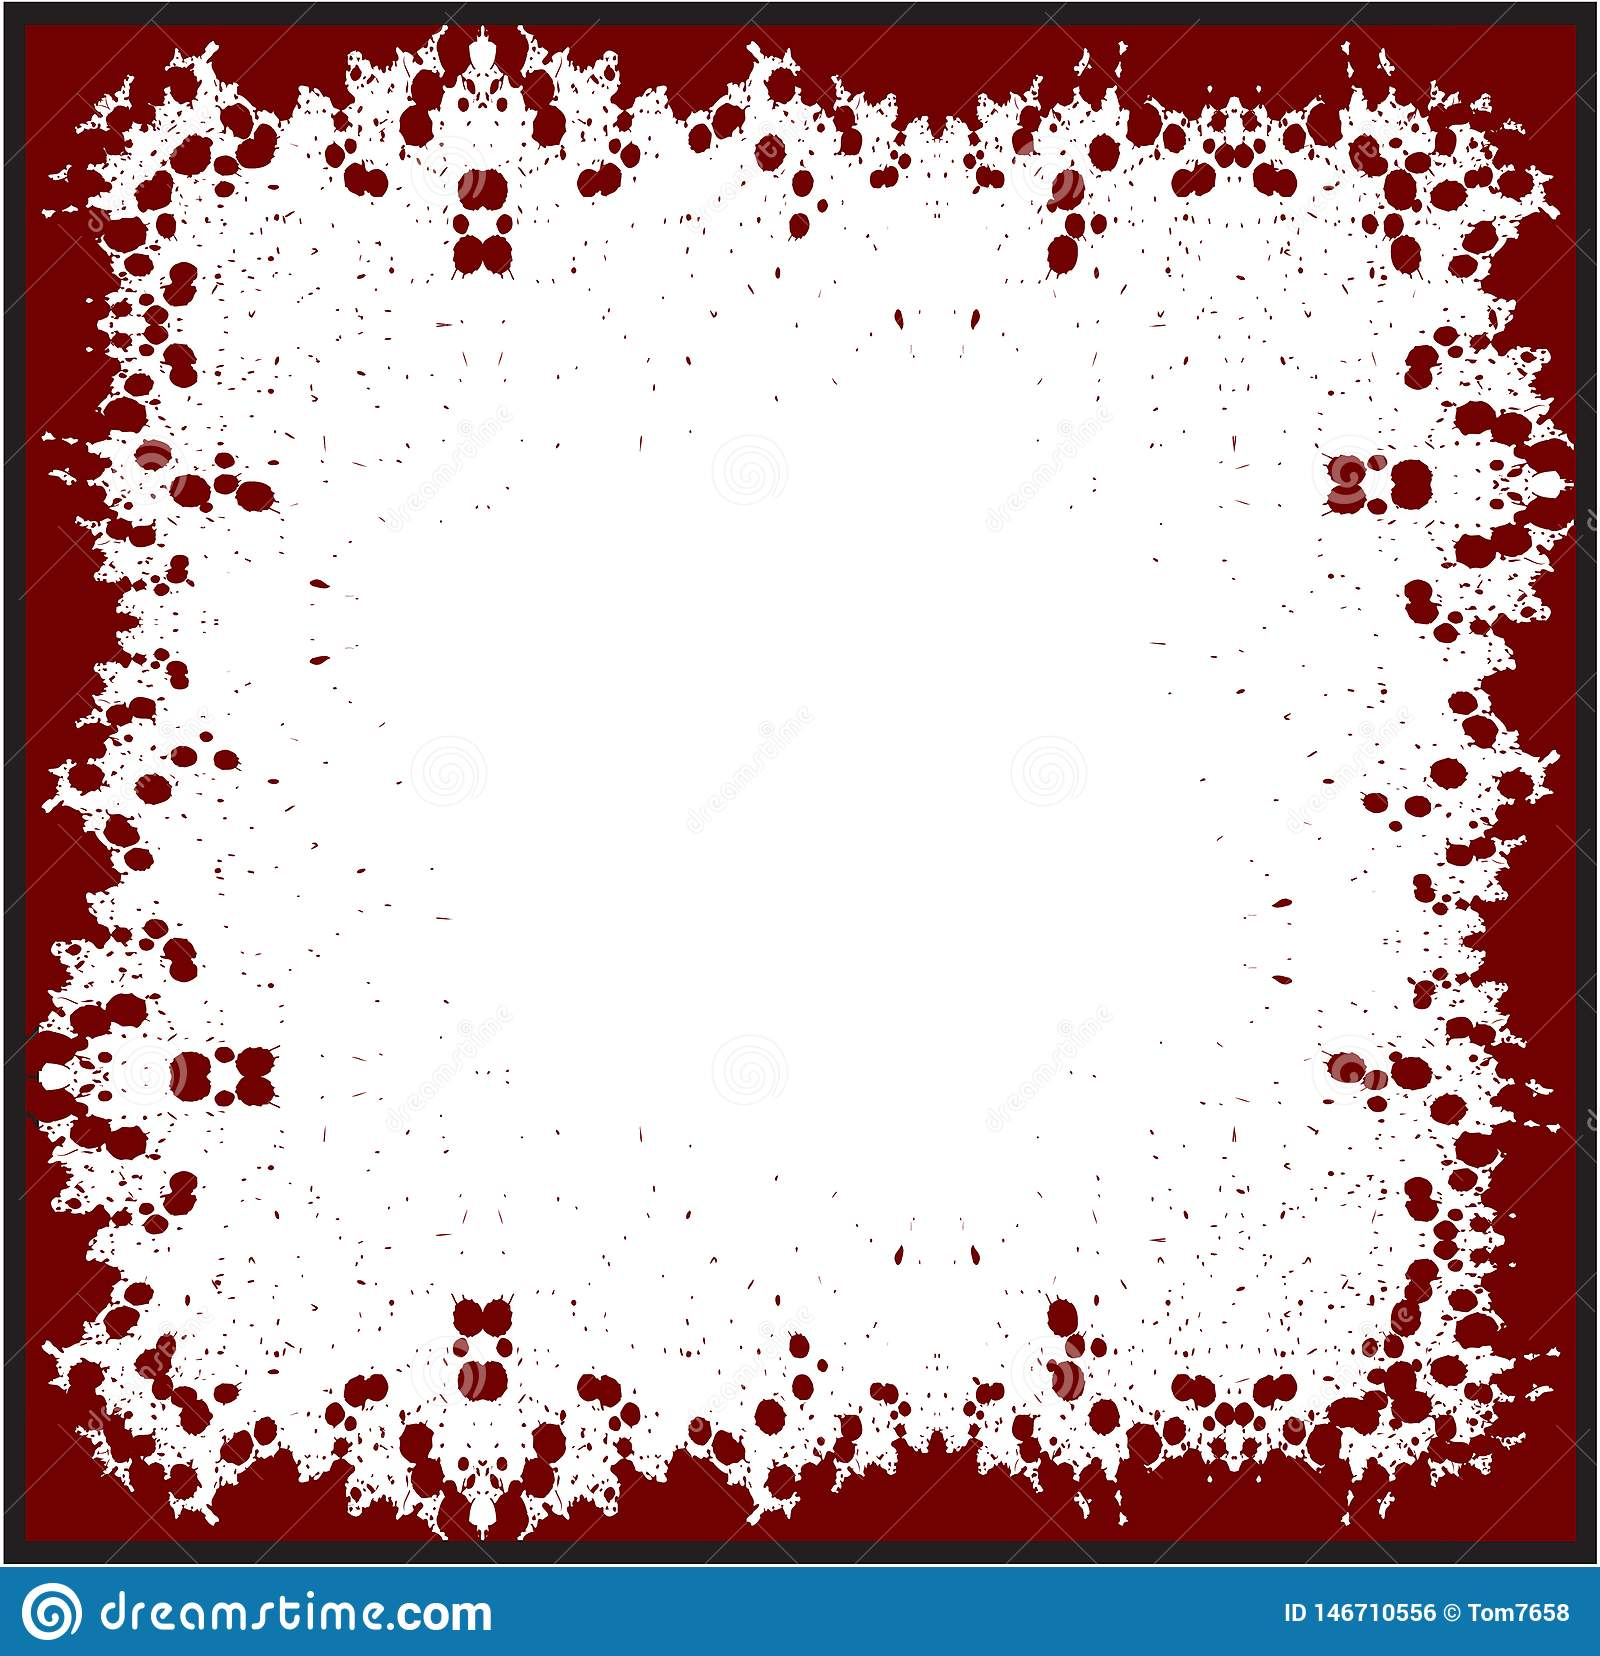 Blood red blooddrop bloody grunge